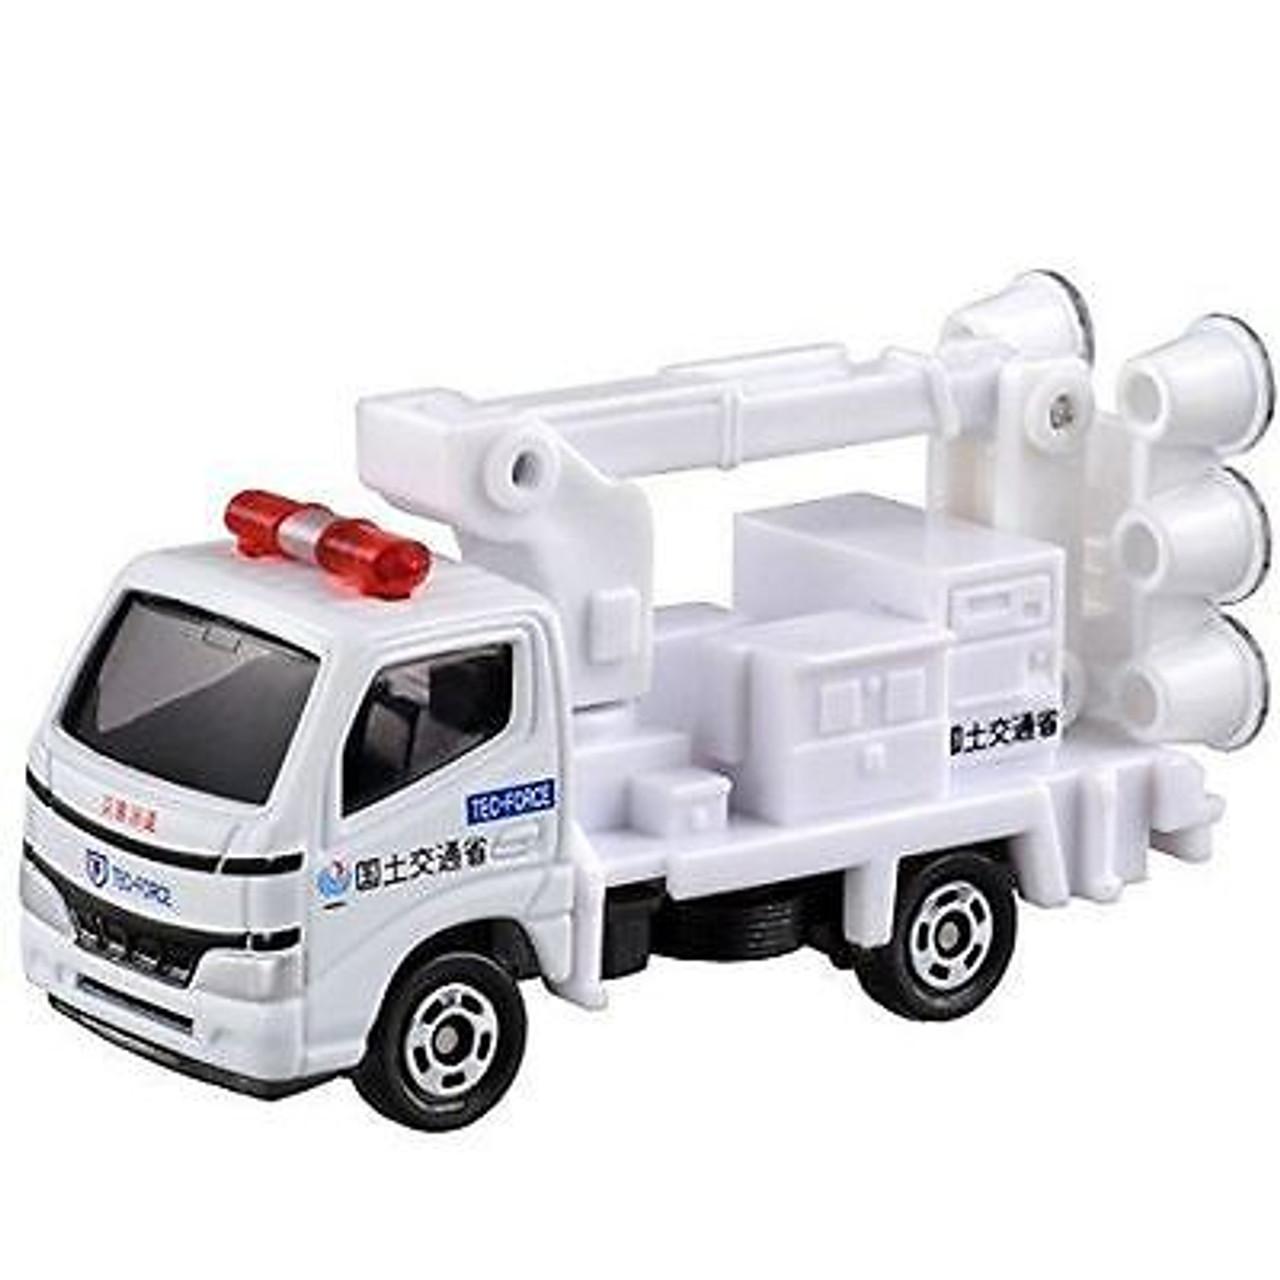 tomica toyota dyna emergency scene lighting vehicle